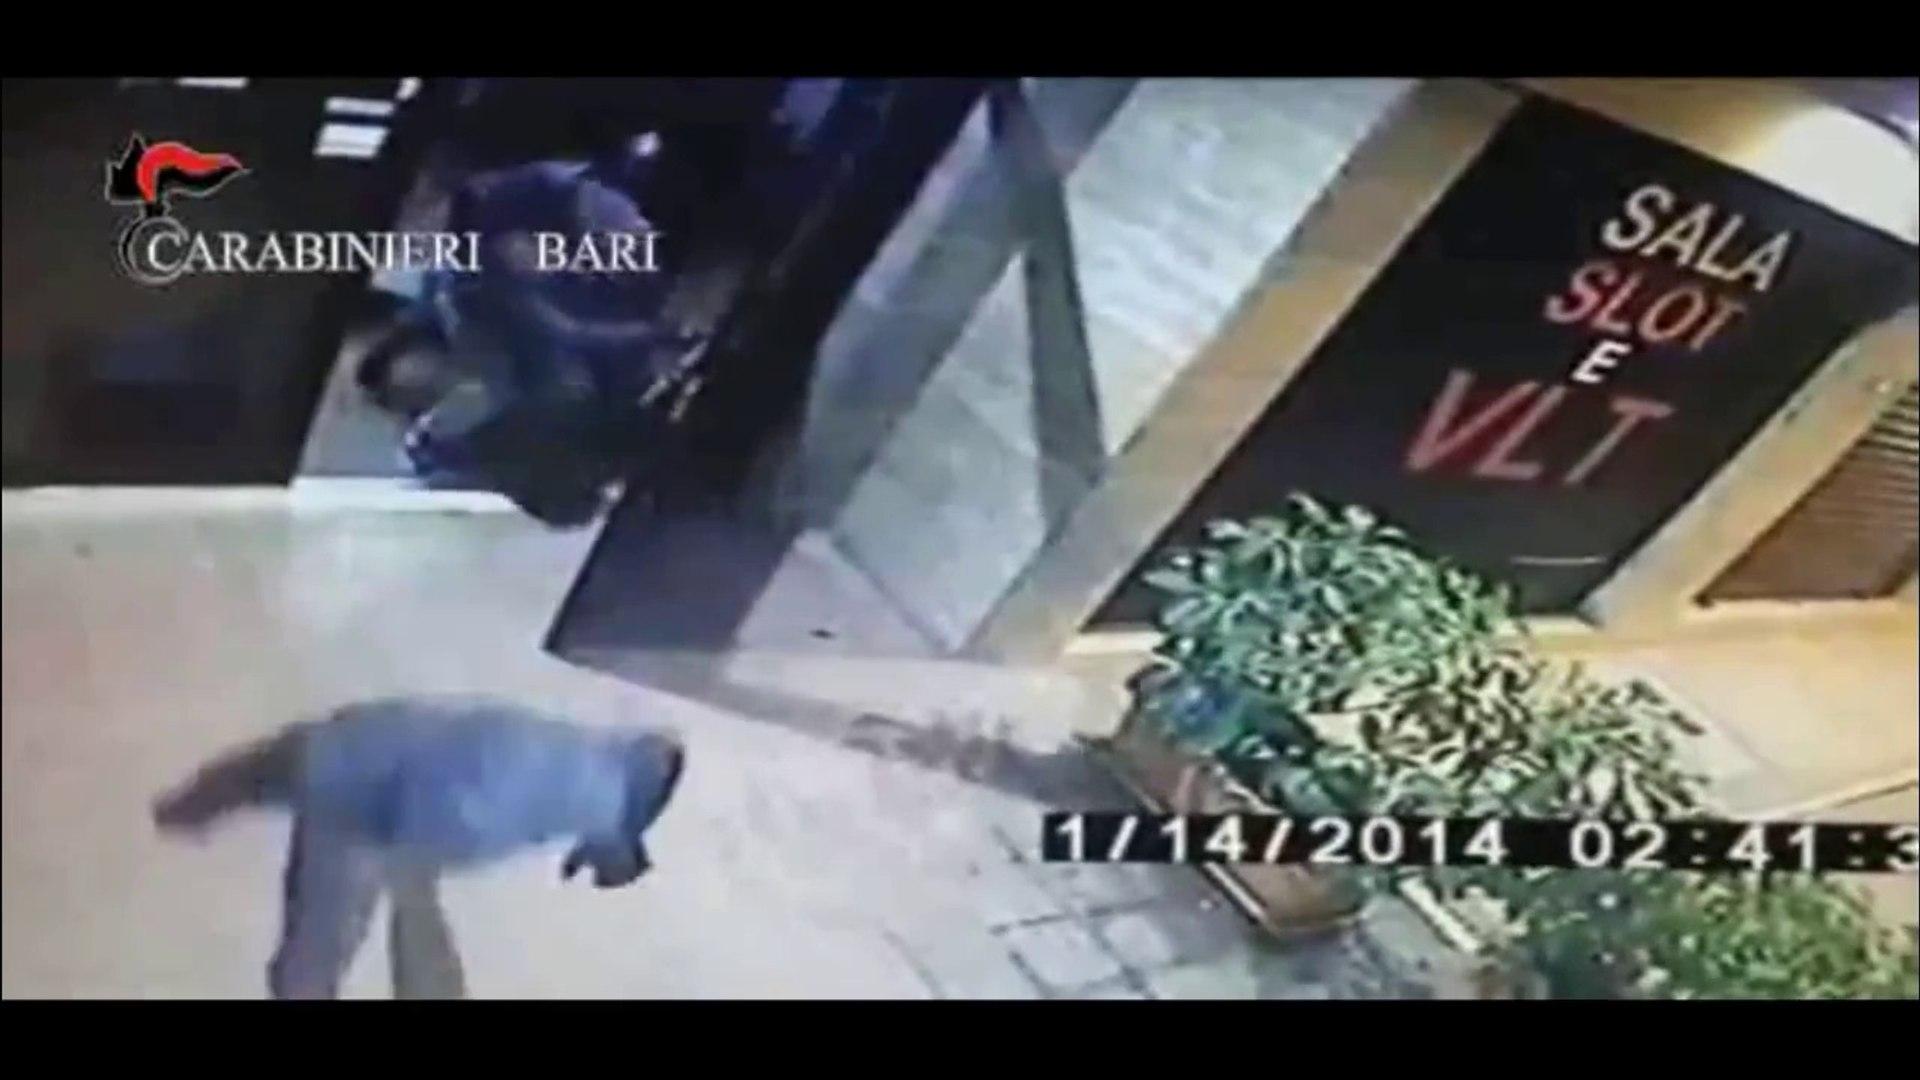 Trani (BAT) - Rapina in una sala slot (29.05.14)